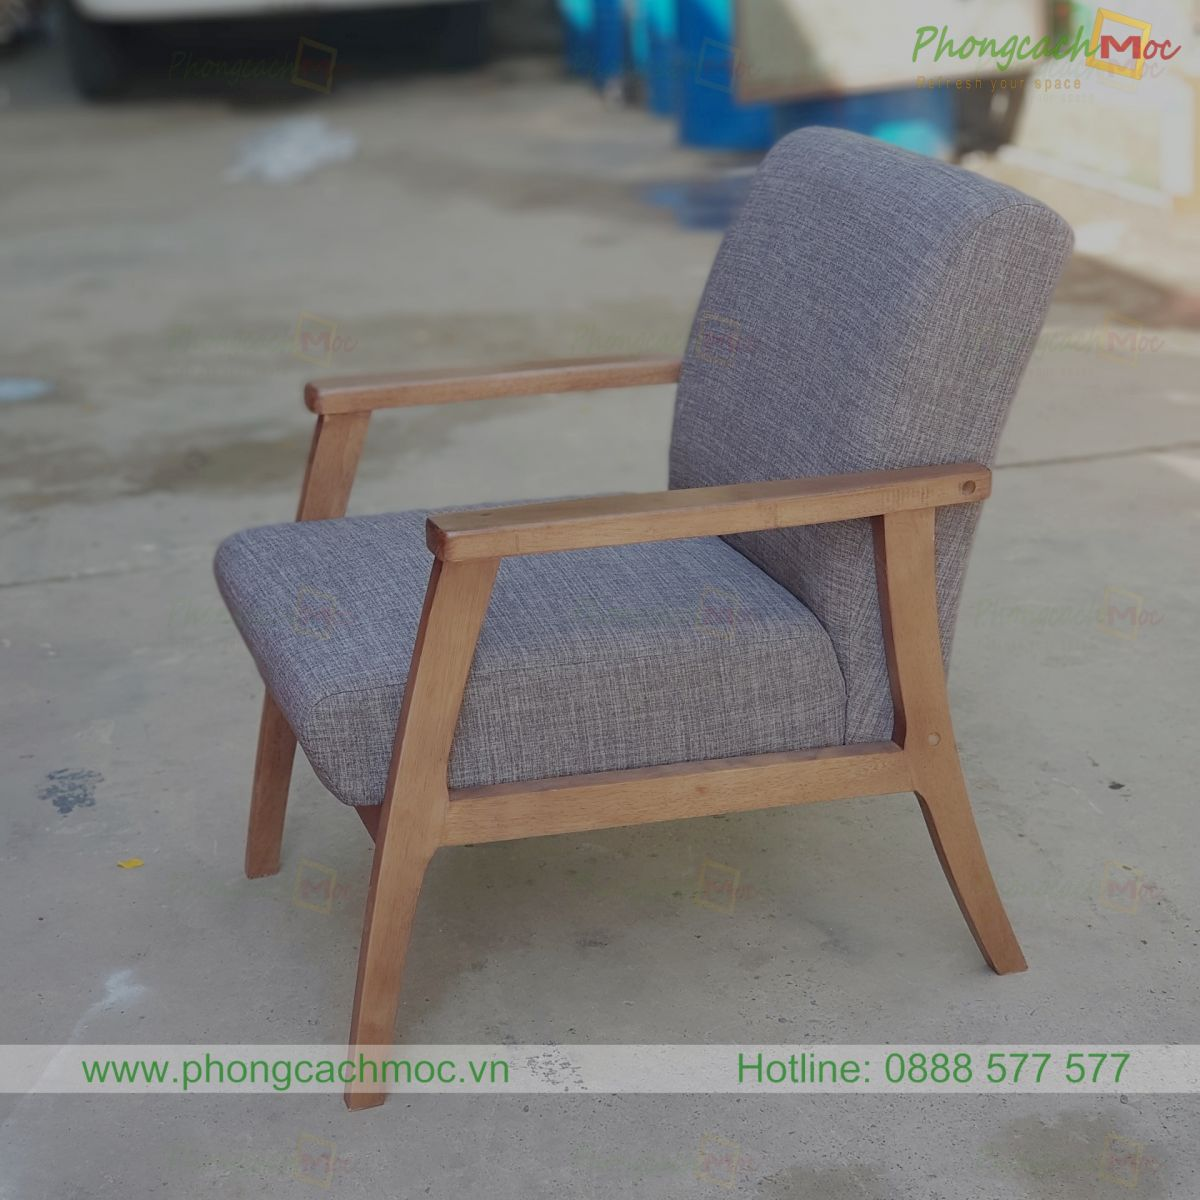 ghe-sofa-khung-go-mf70-1